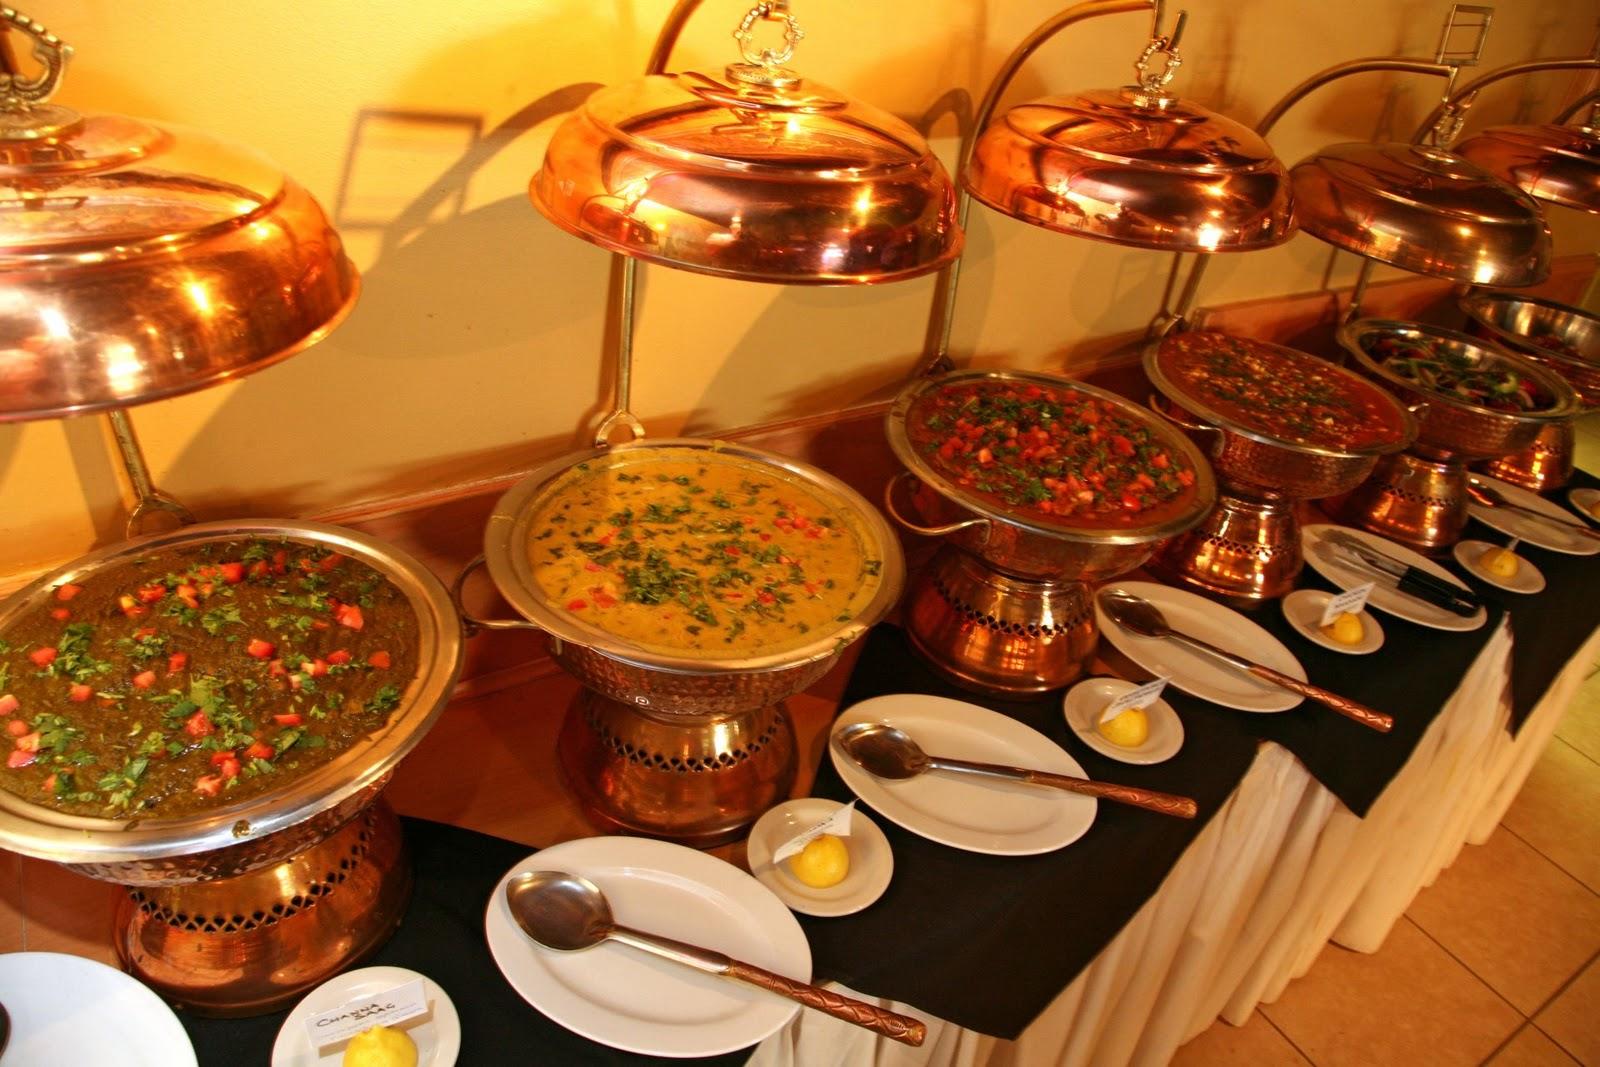 mangalorean food caterers in bangalore dating